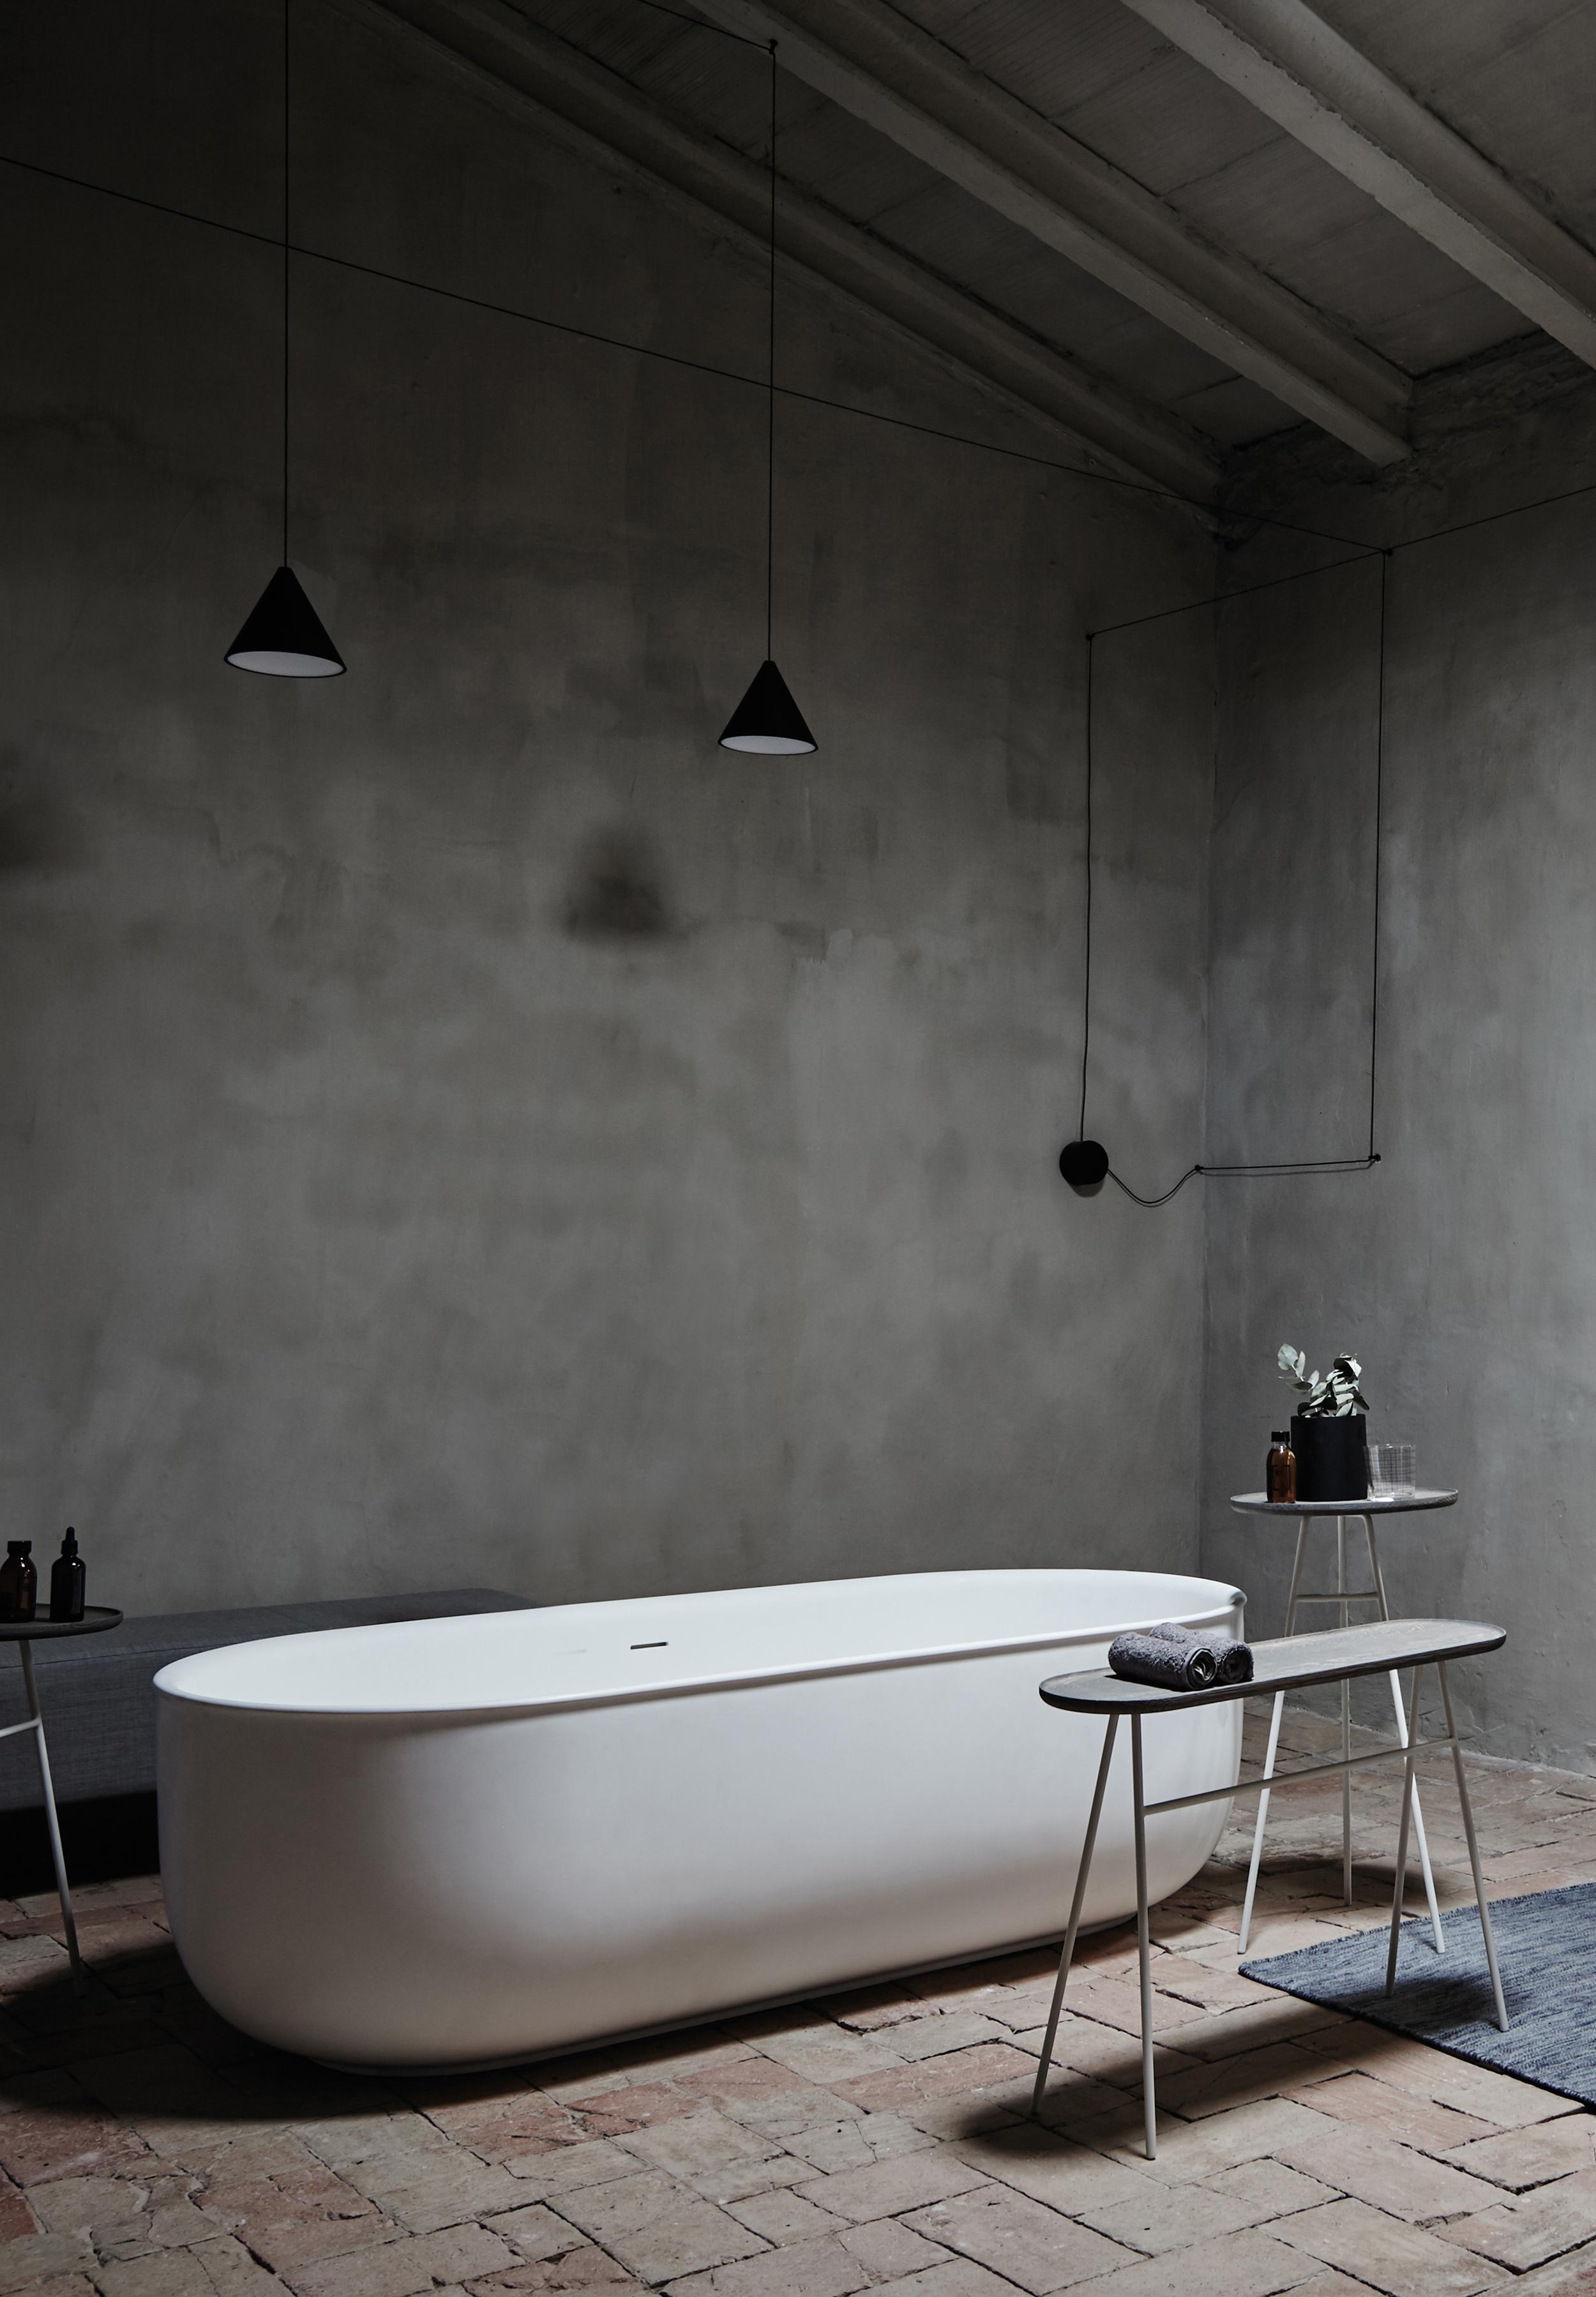 A minimalist bathroom